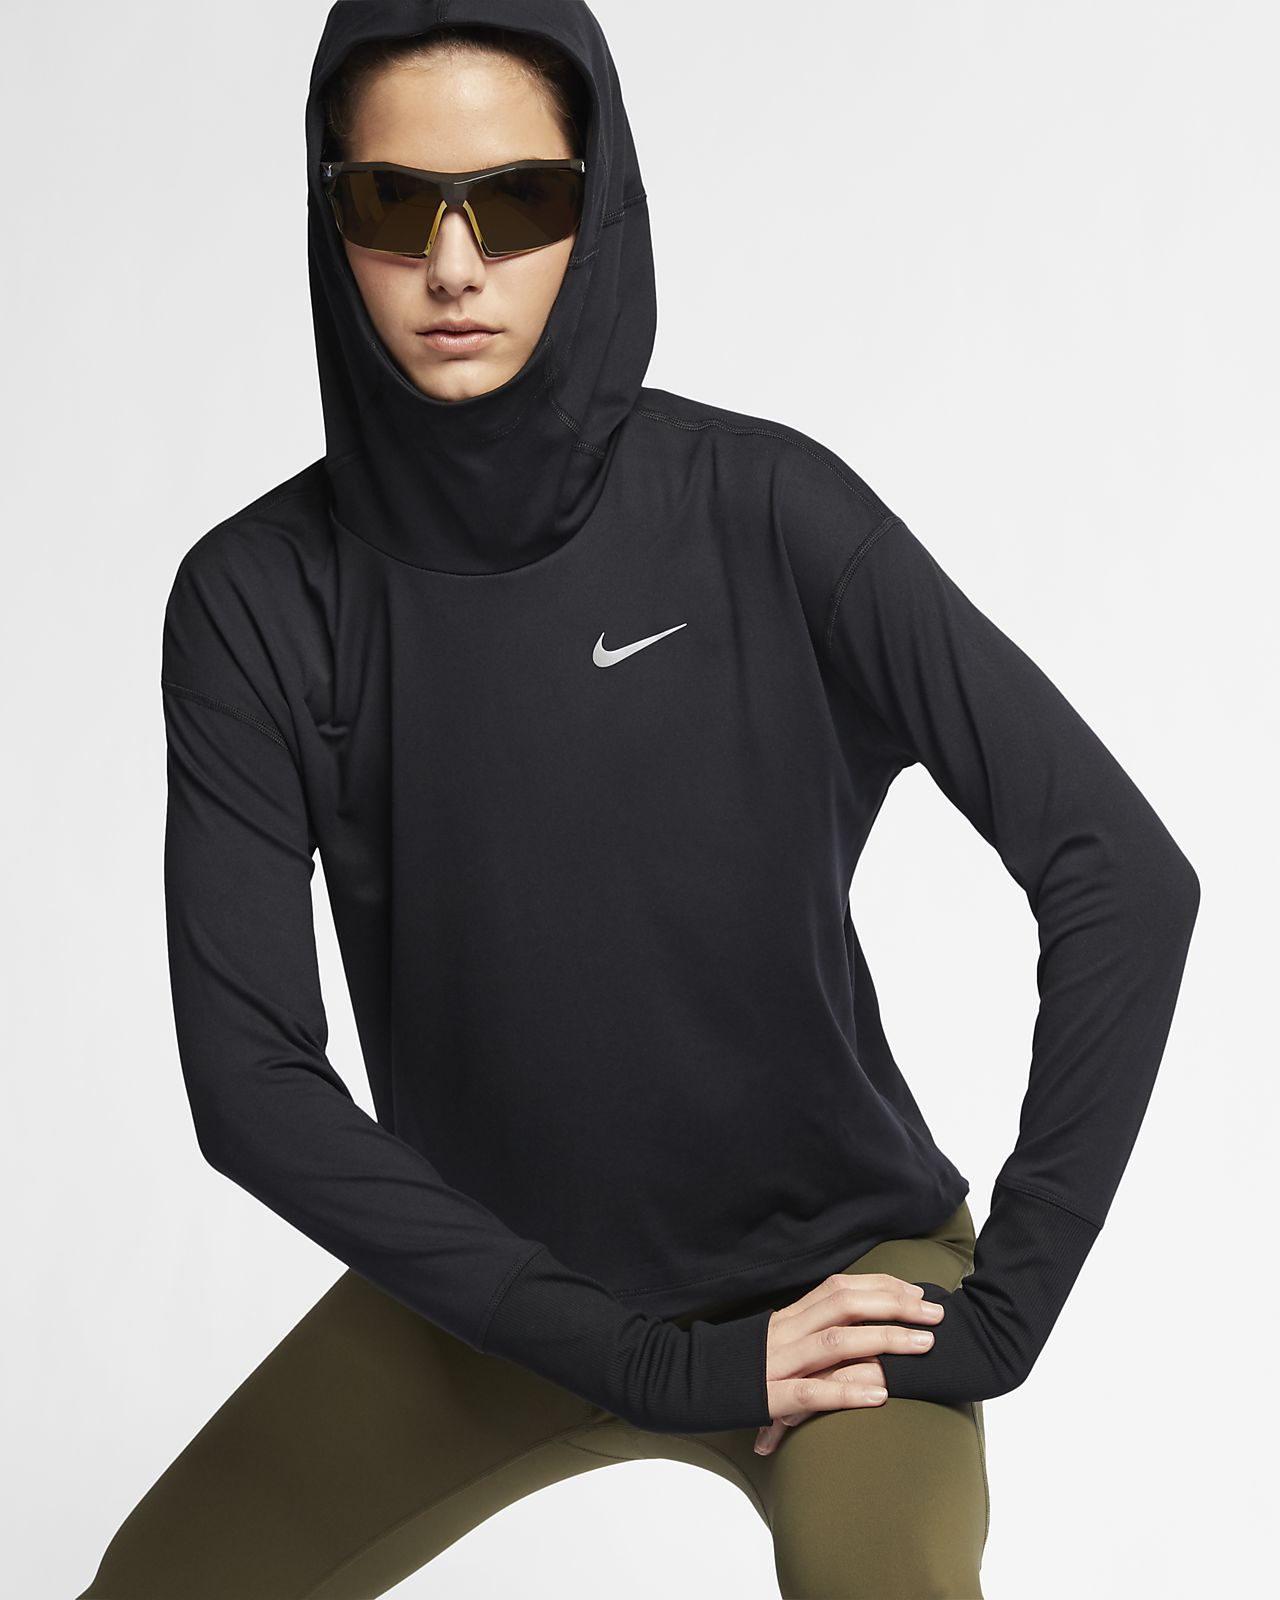 Pr Para Nike Mujer Running Sudadera Con Capucha Element De qxwIO87R